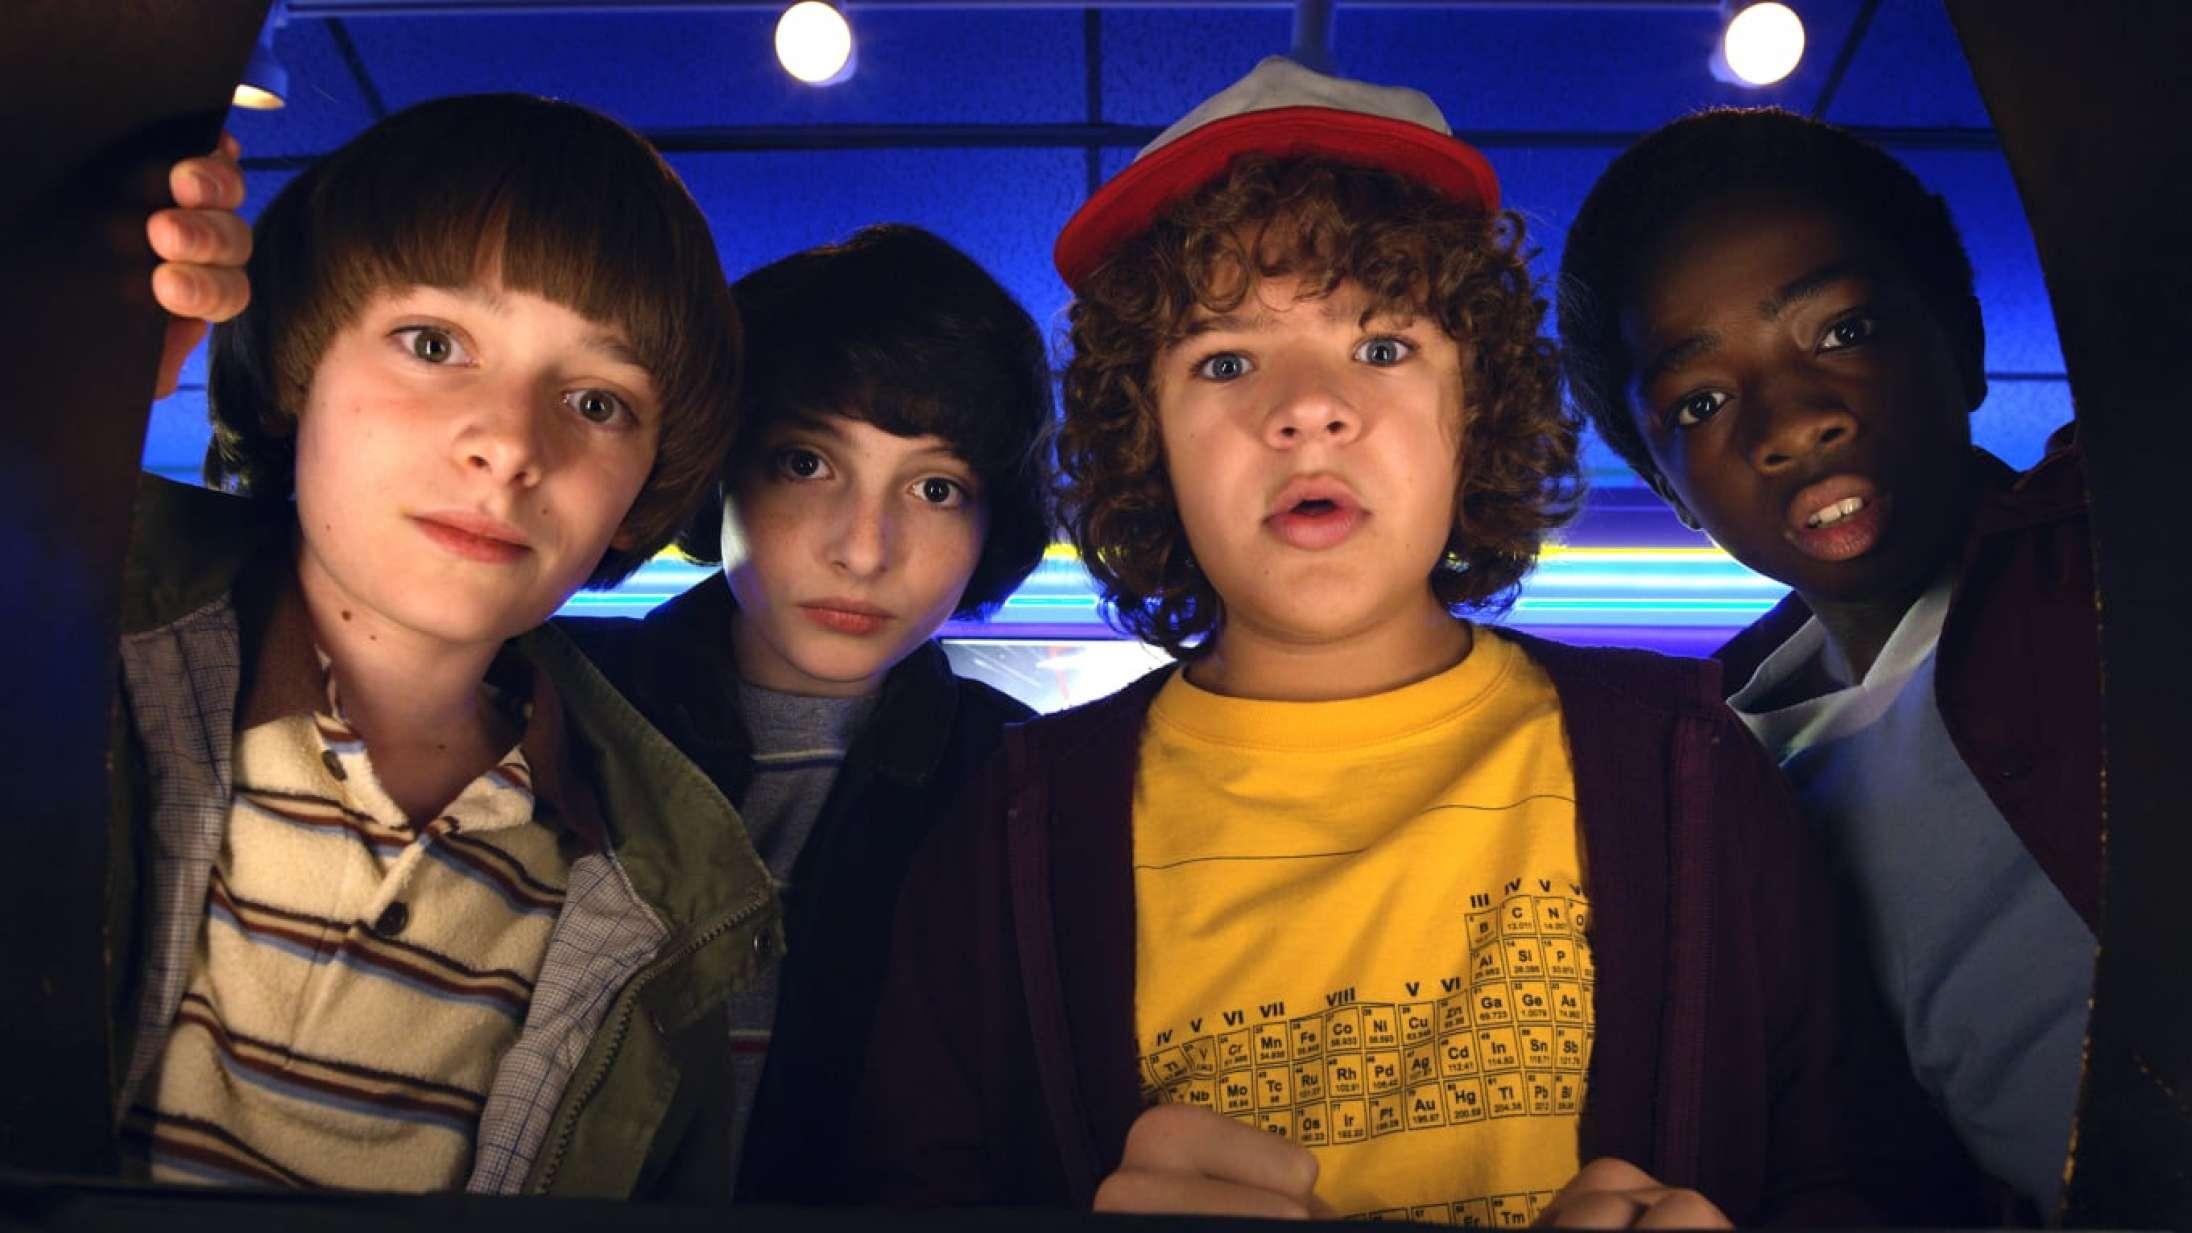 Ny 'Stranger Things'-trailer løfter sløret for en dyster forhistorie i sæson 4